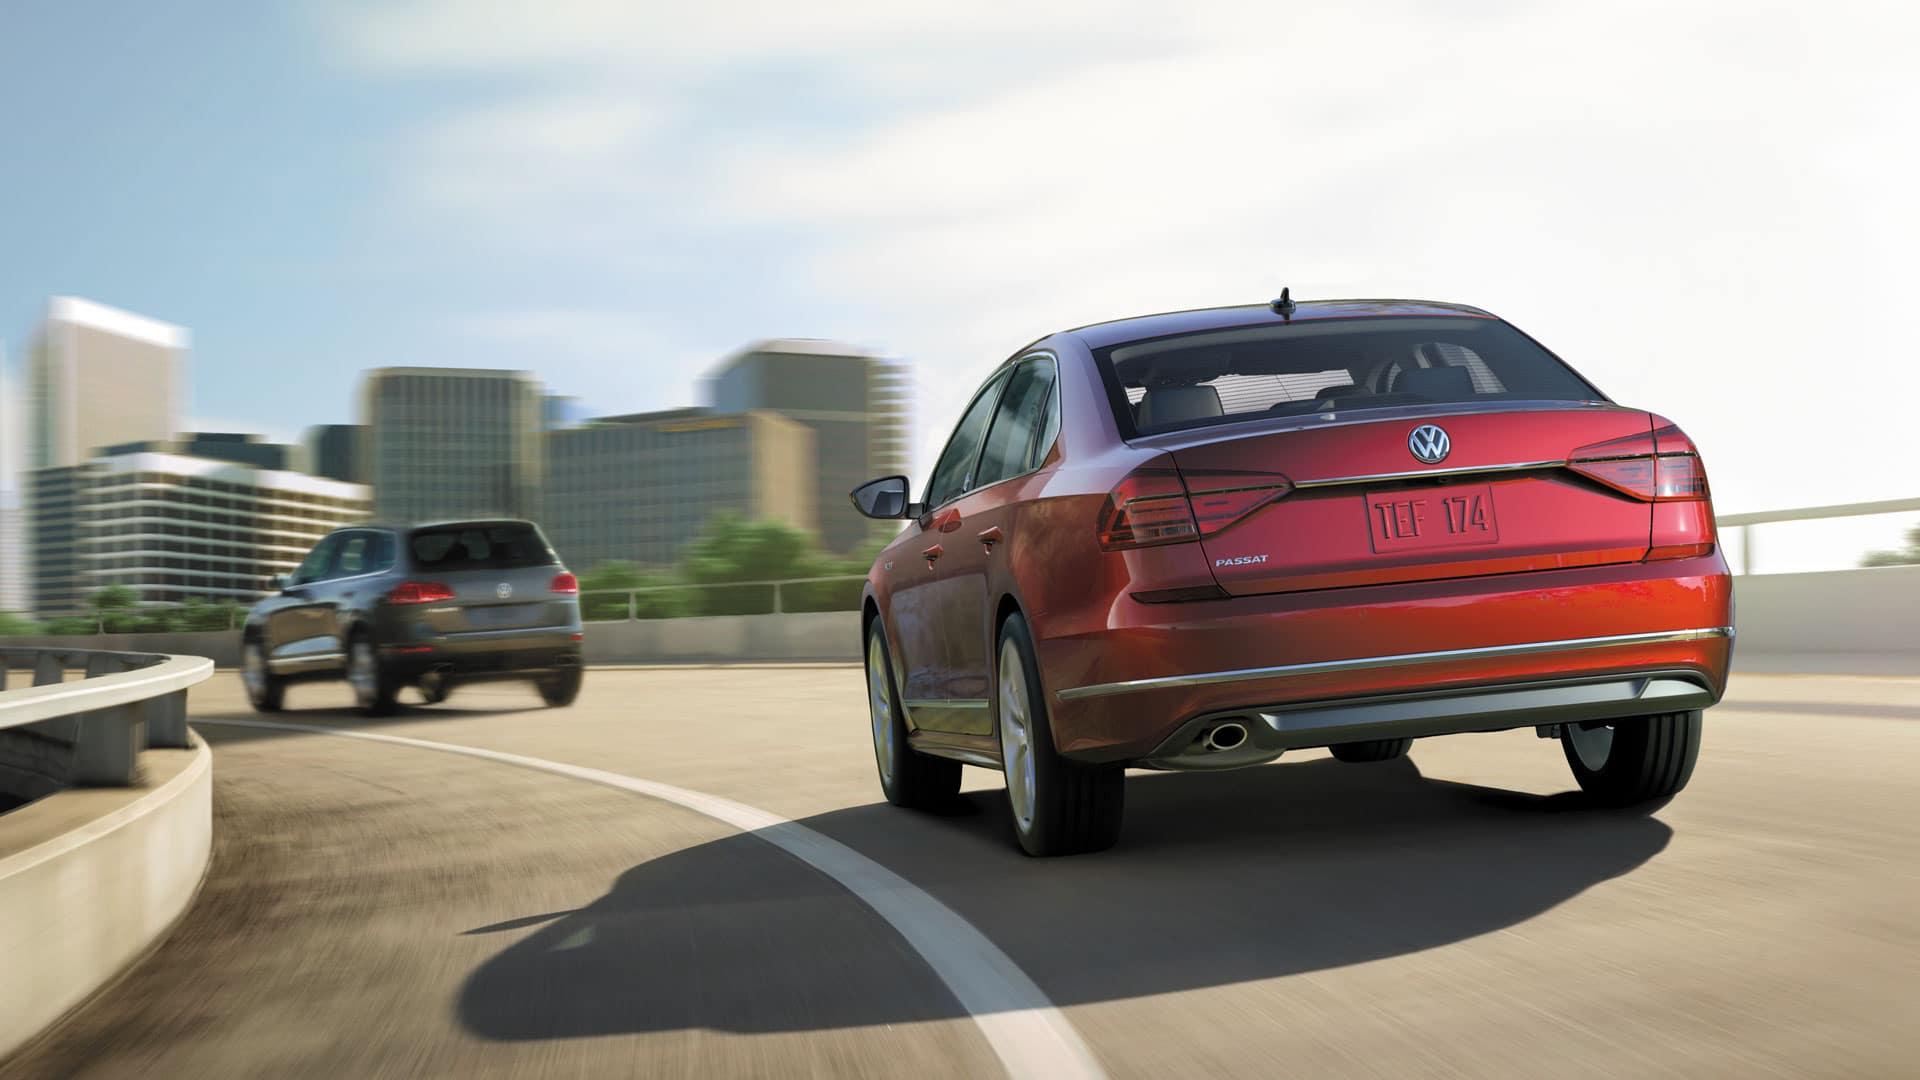 2019 VW Passat adaptive cruise control